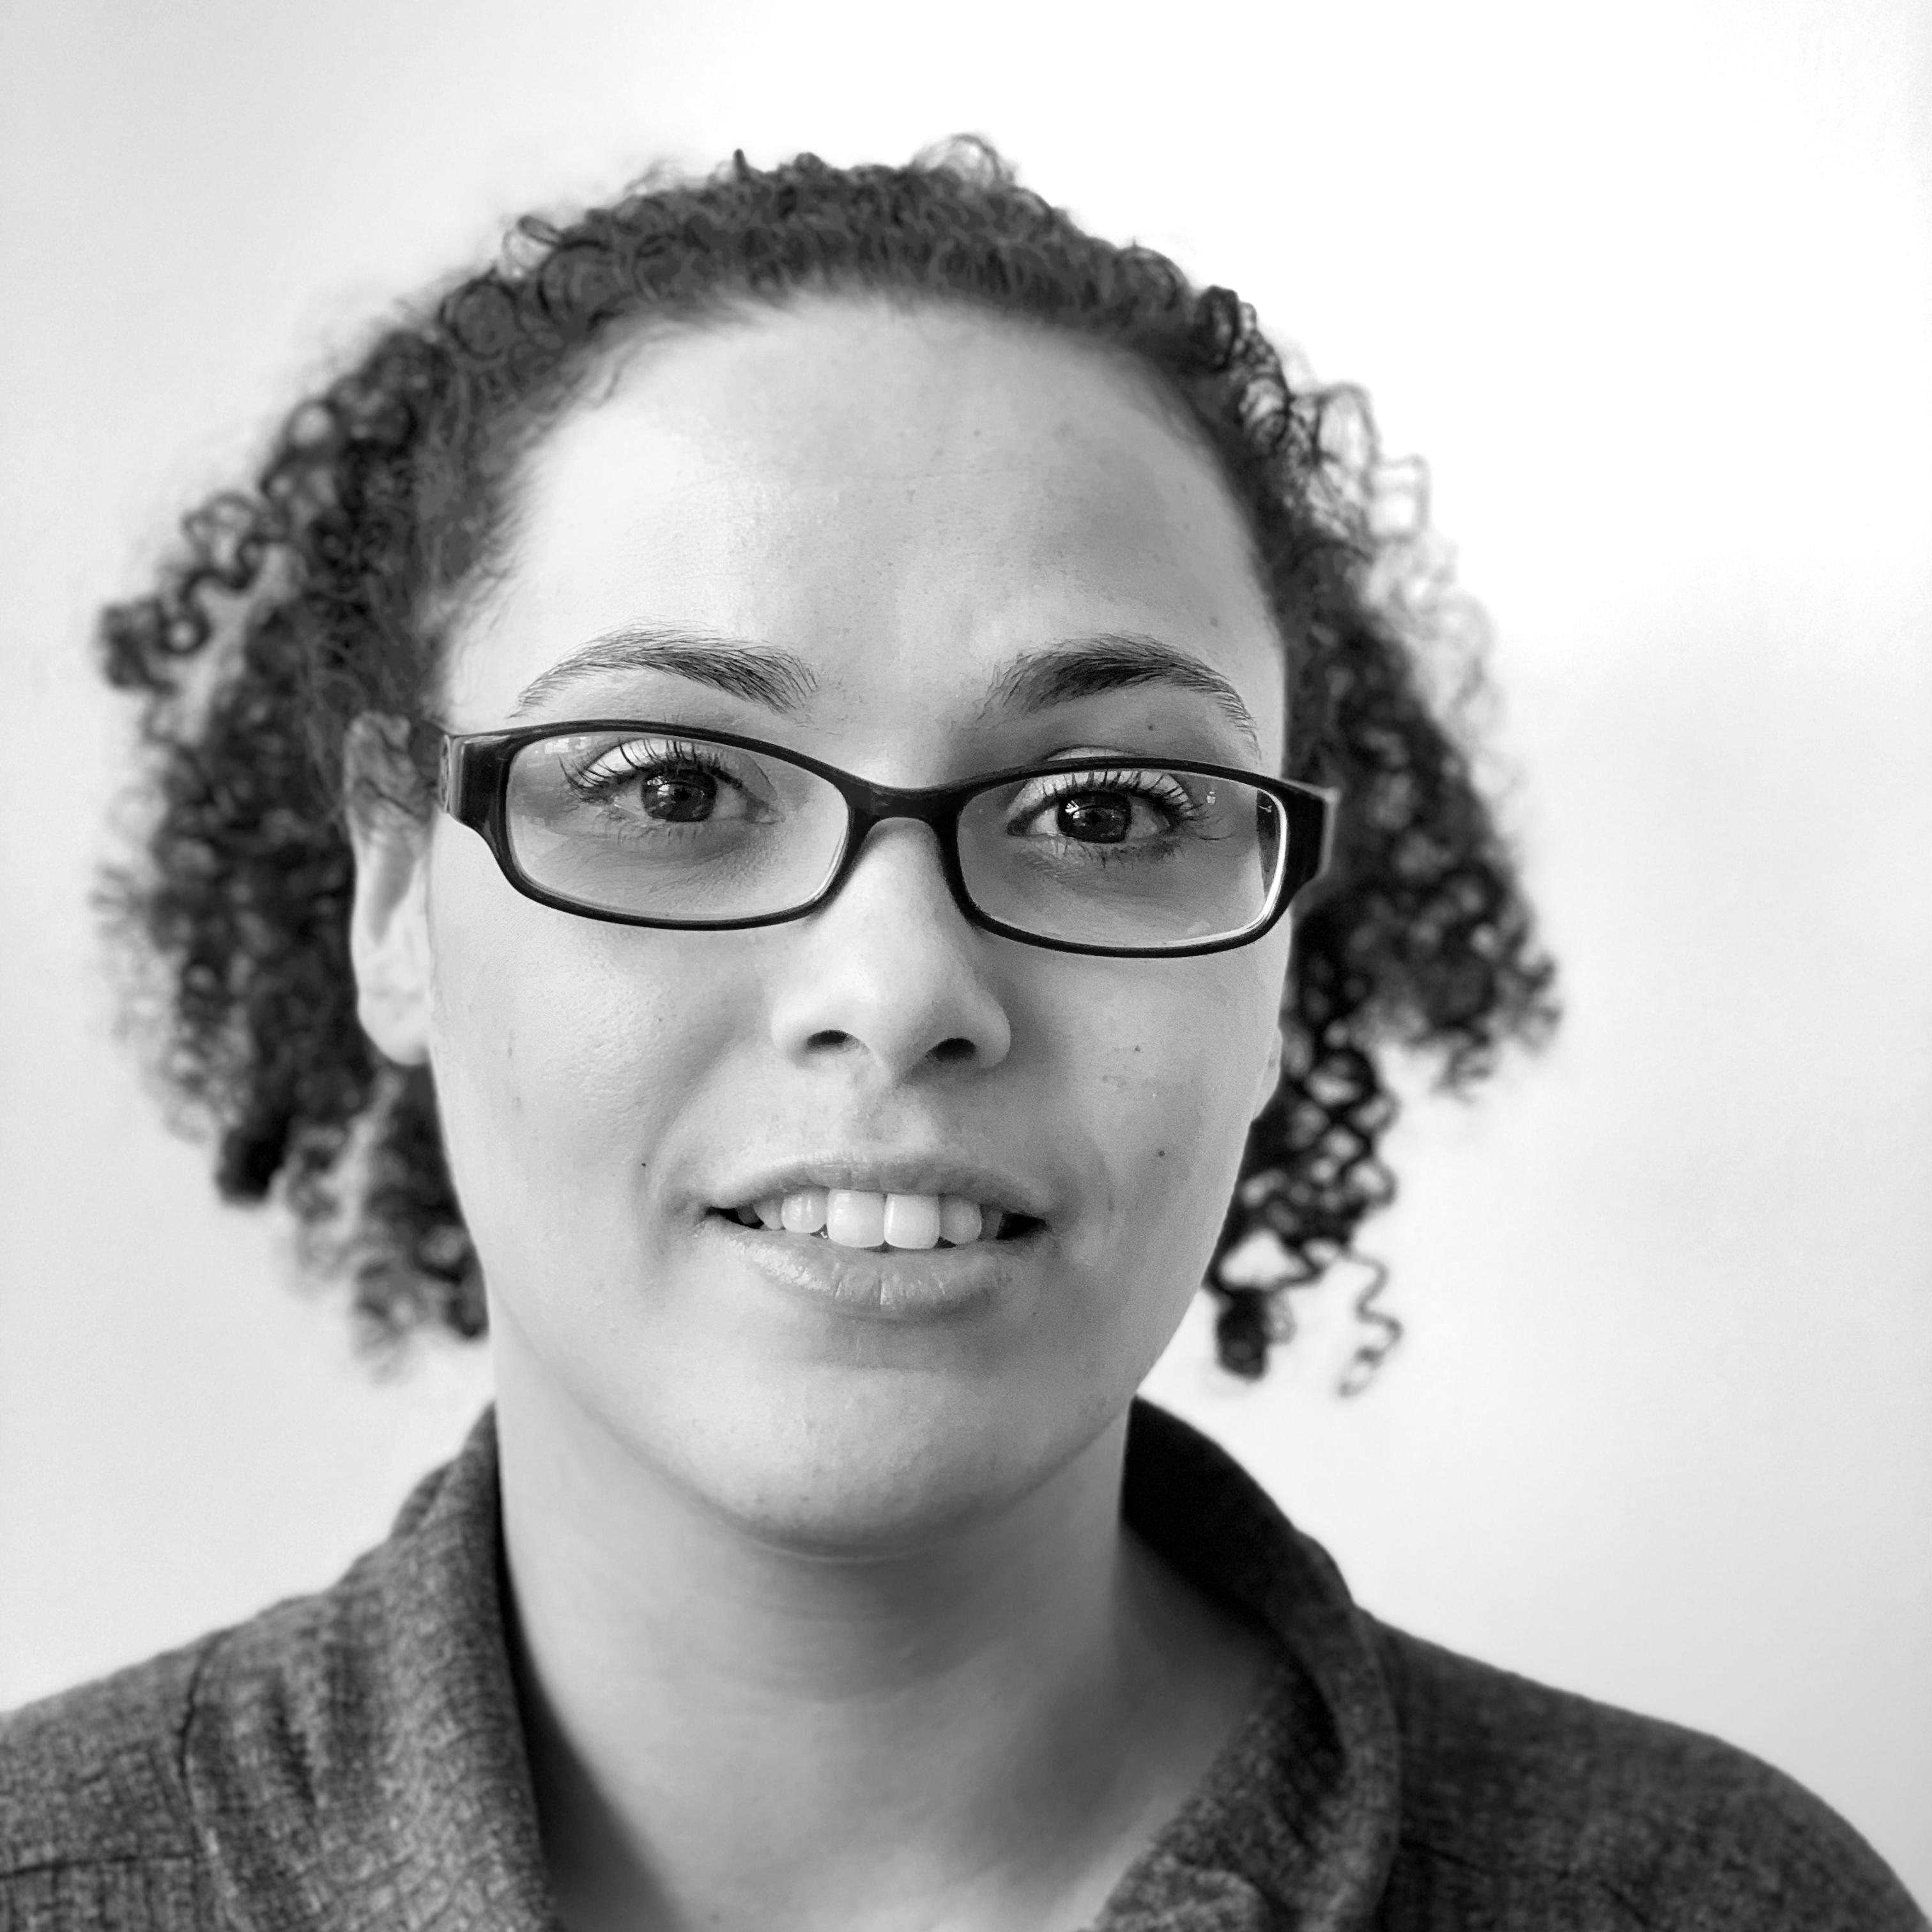 Lucie de Freitas